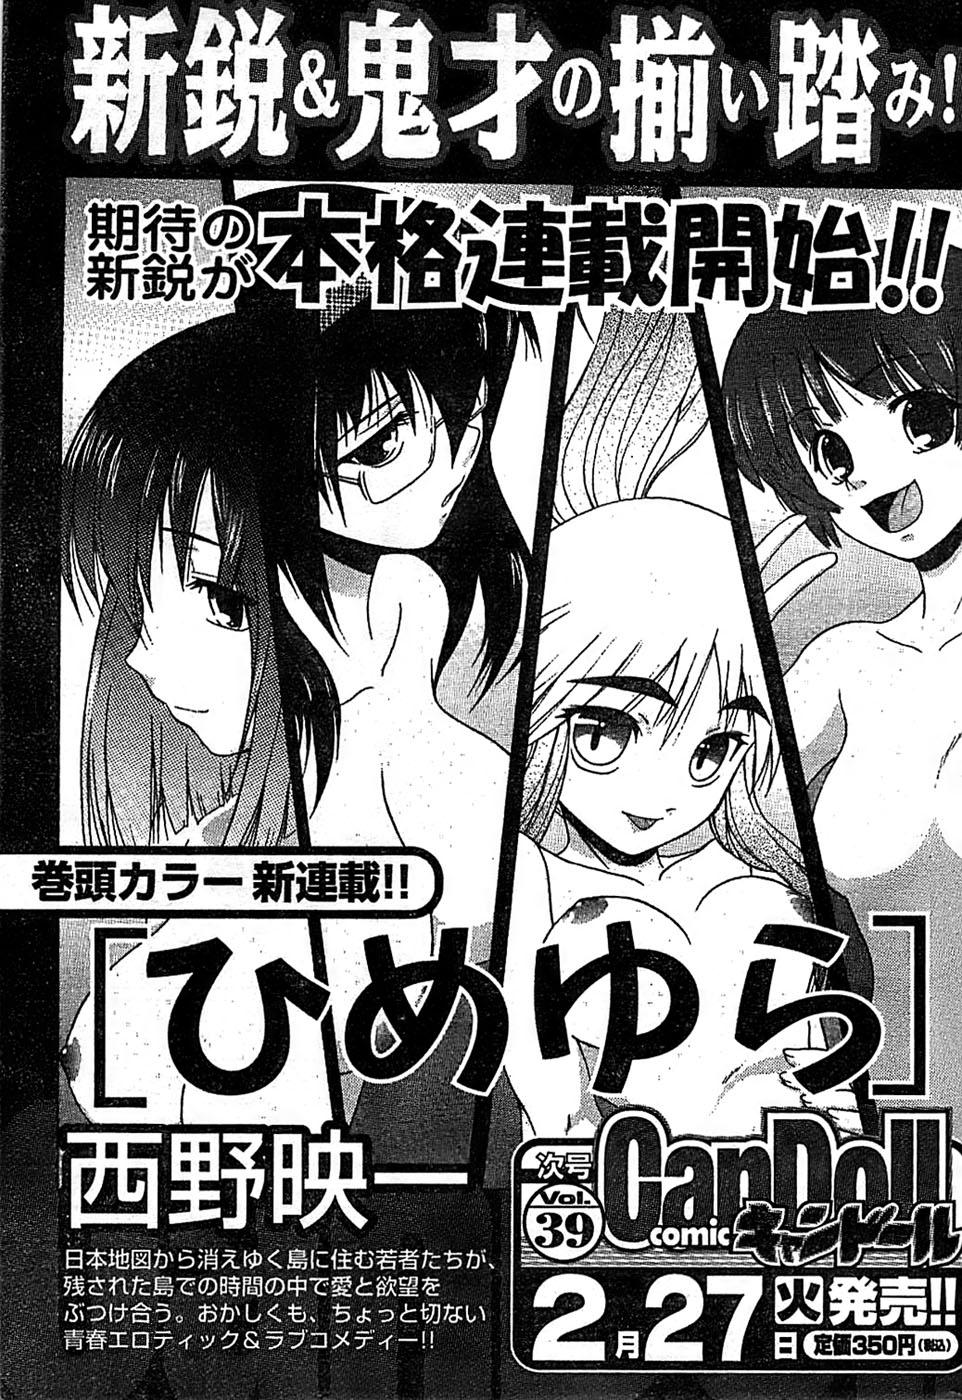 COMIC CanDoll 2007-03 Vol. 38 264